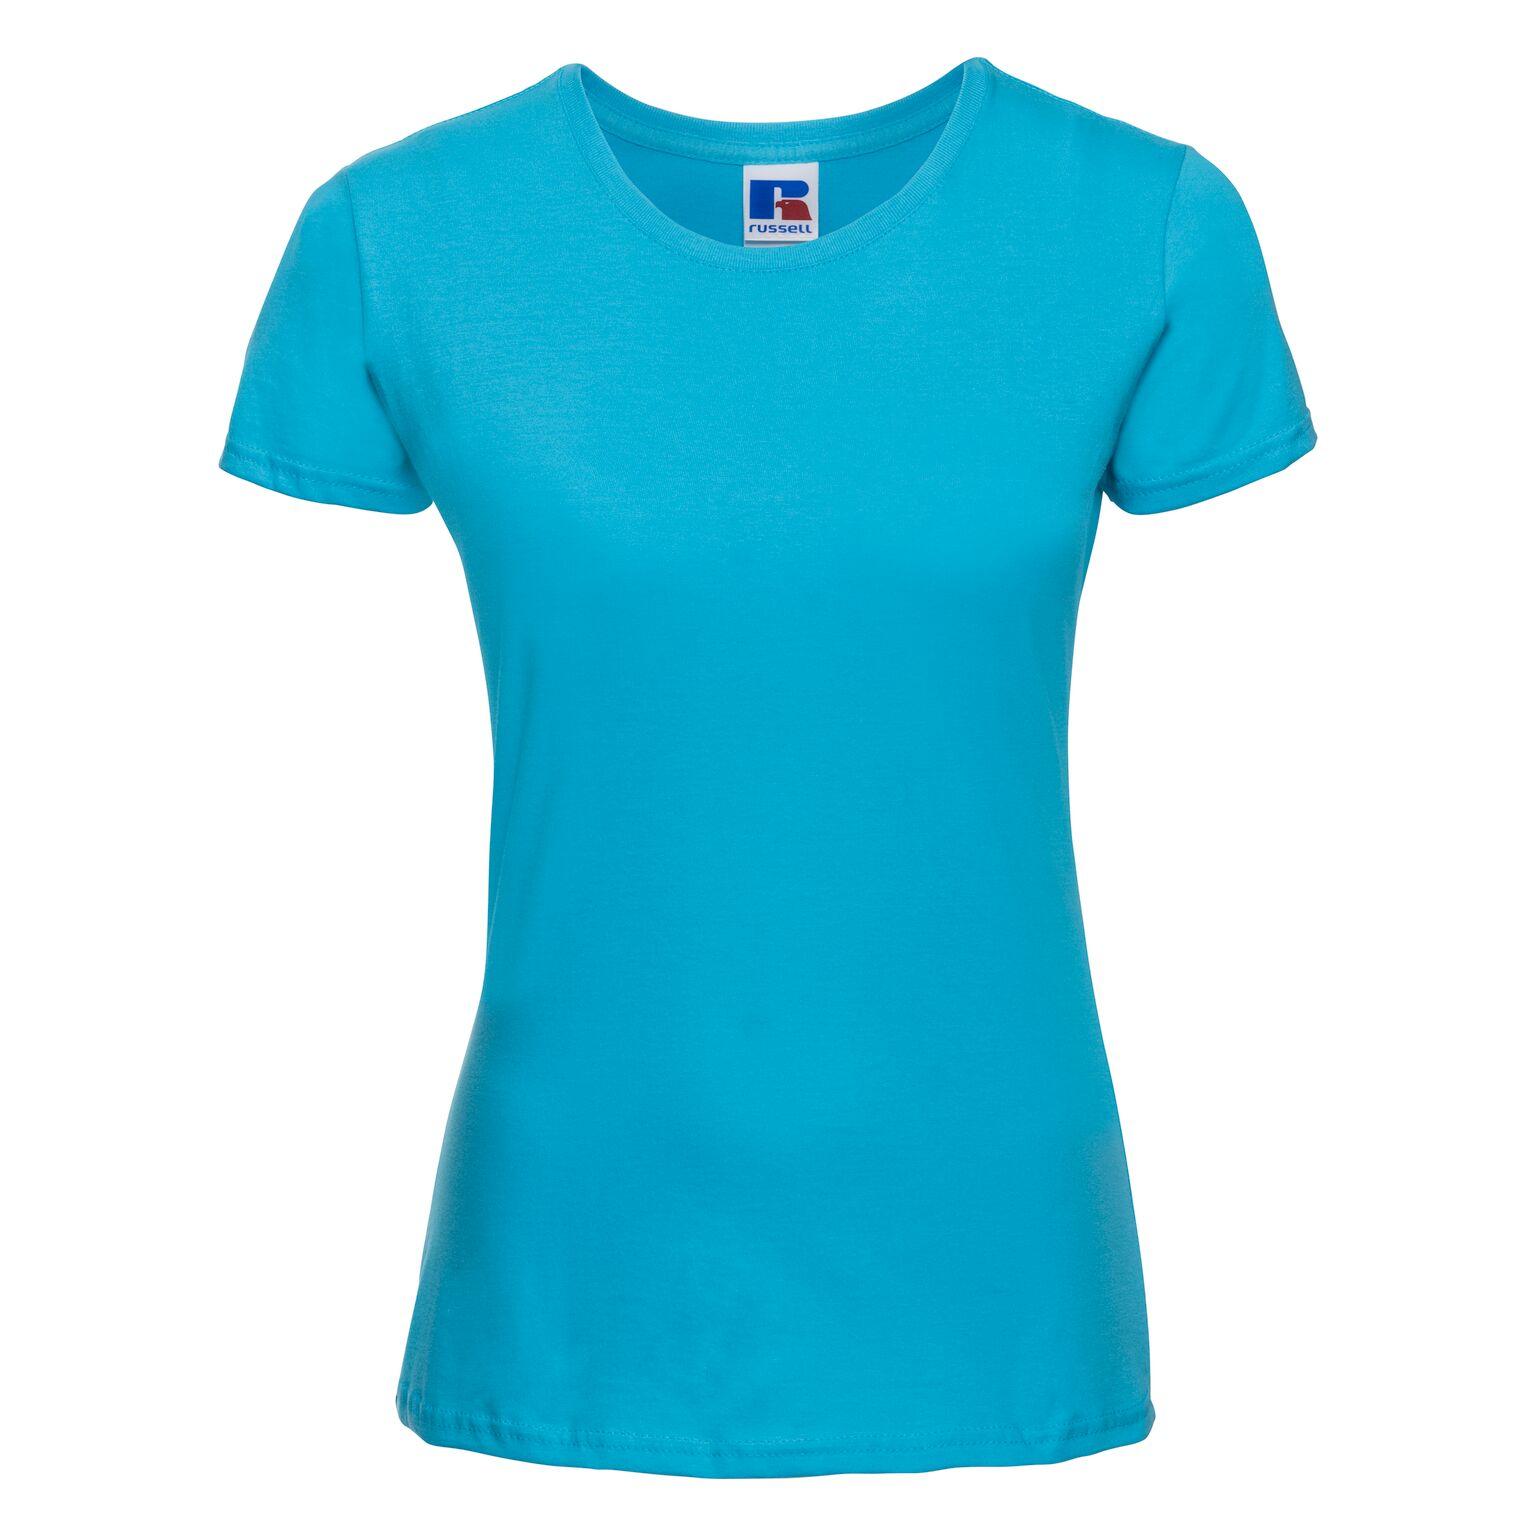 01_j155f_turquoise--0-0--eb1c3561-c6a1-4e81-9ebe-874719843dbd